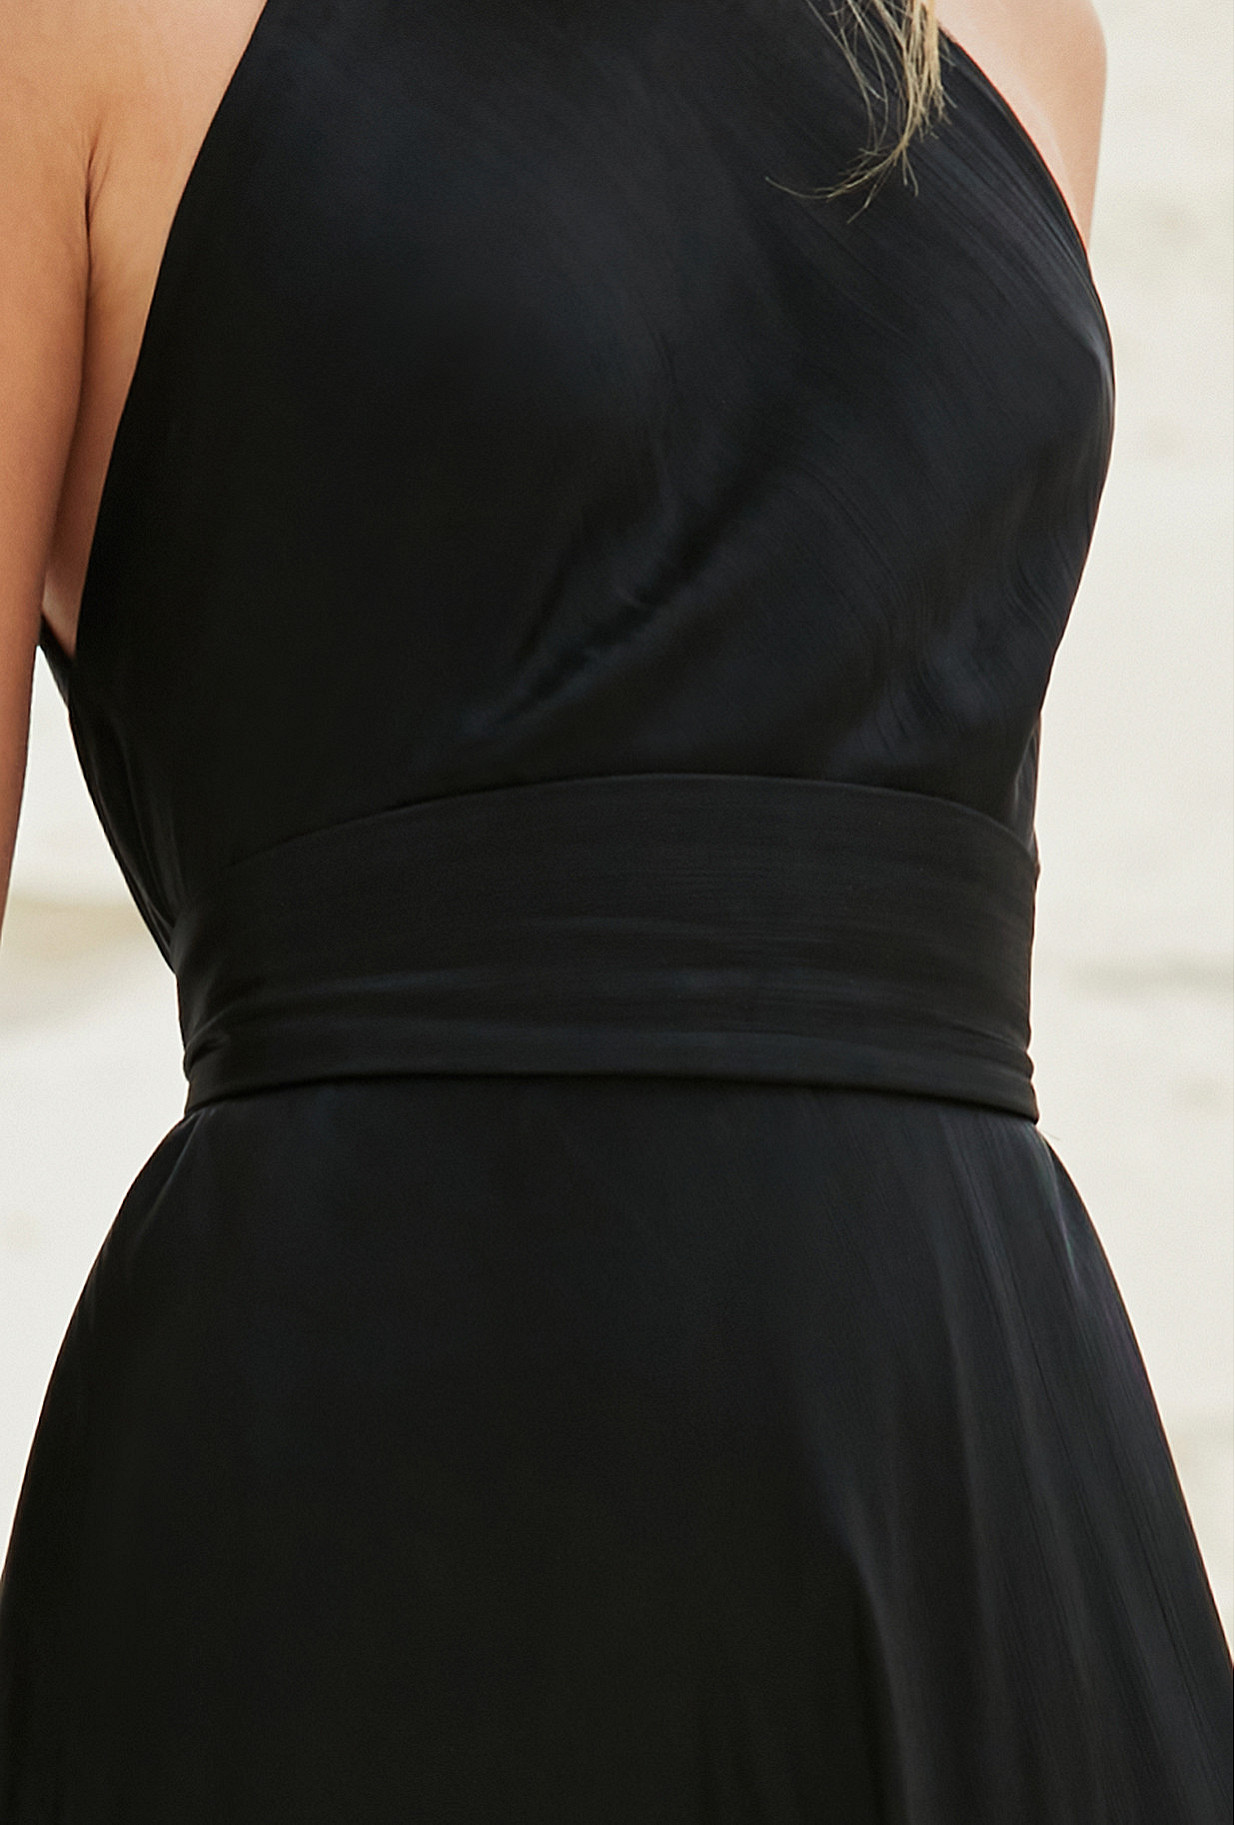 Belt Biba Mes Demoiselles color Black